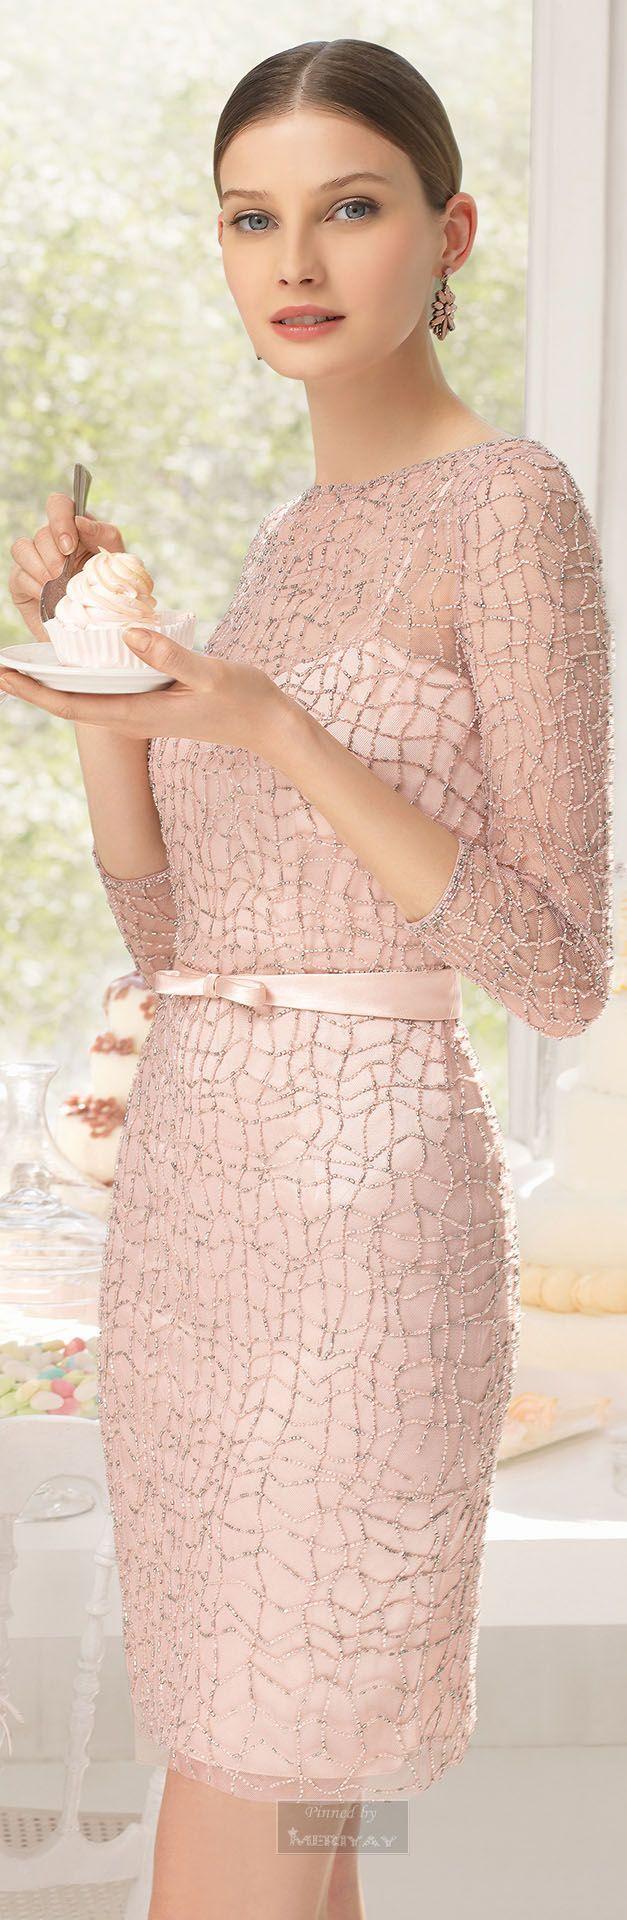 Valentina Alexandra | ¶¶ La Vie en Rose ¶¶ | Pinterest | Vestiditos ...